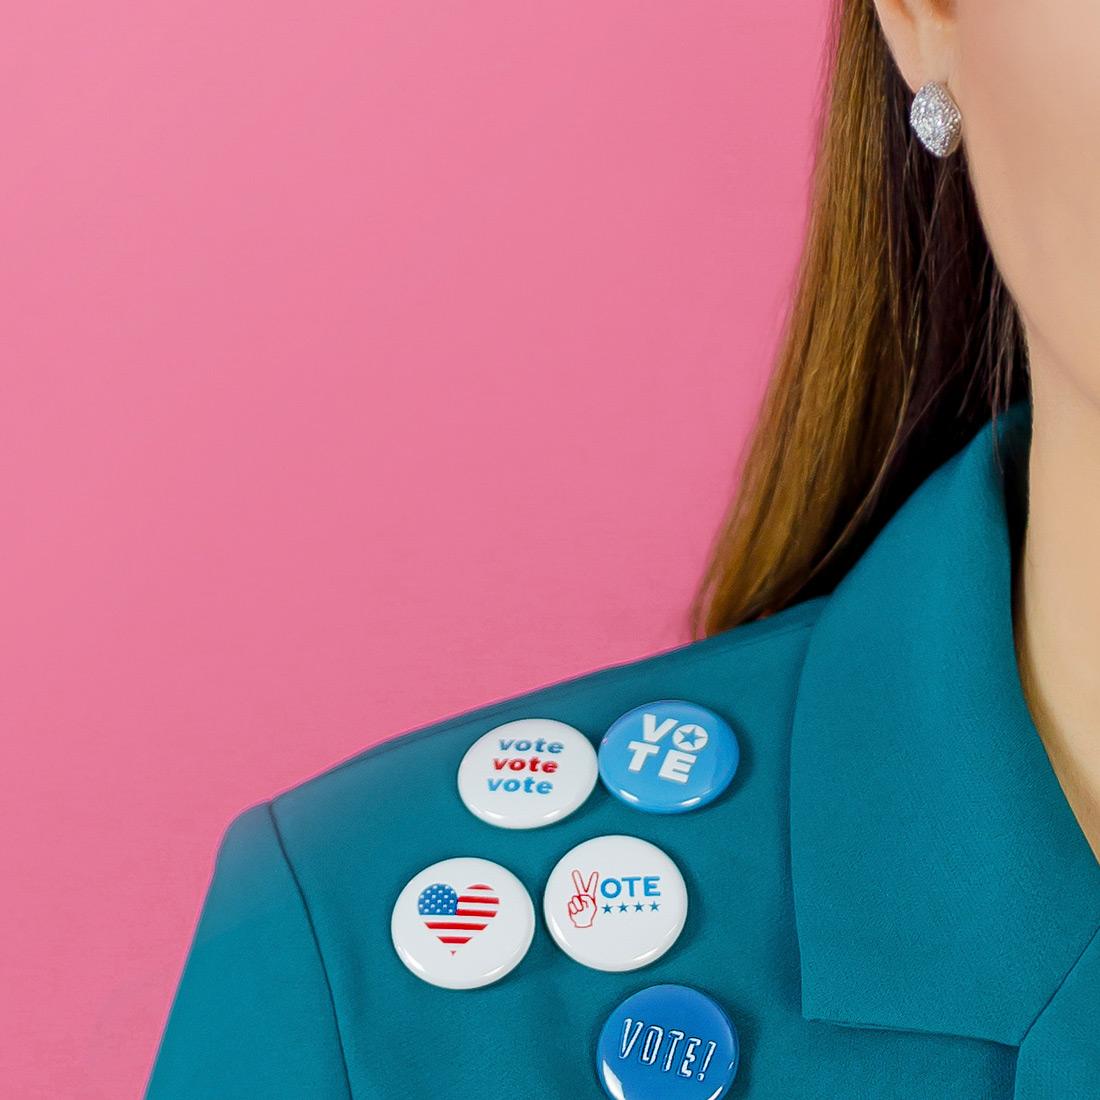 Jennifer Lake Politician Buttons